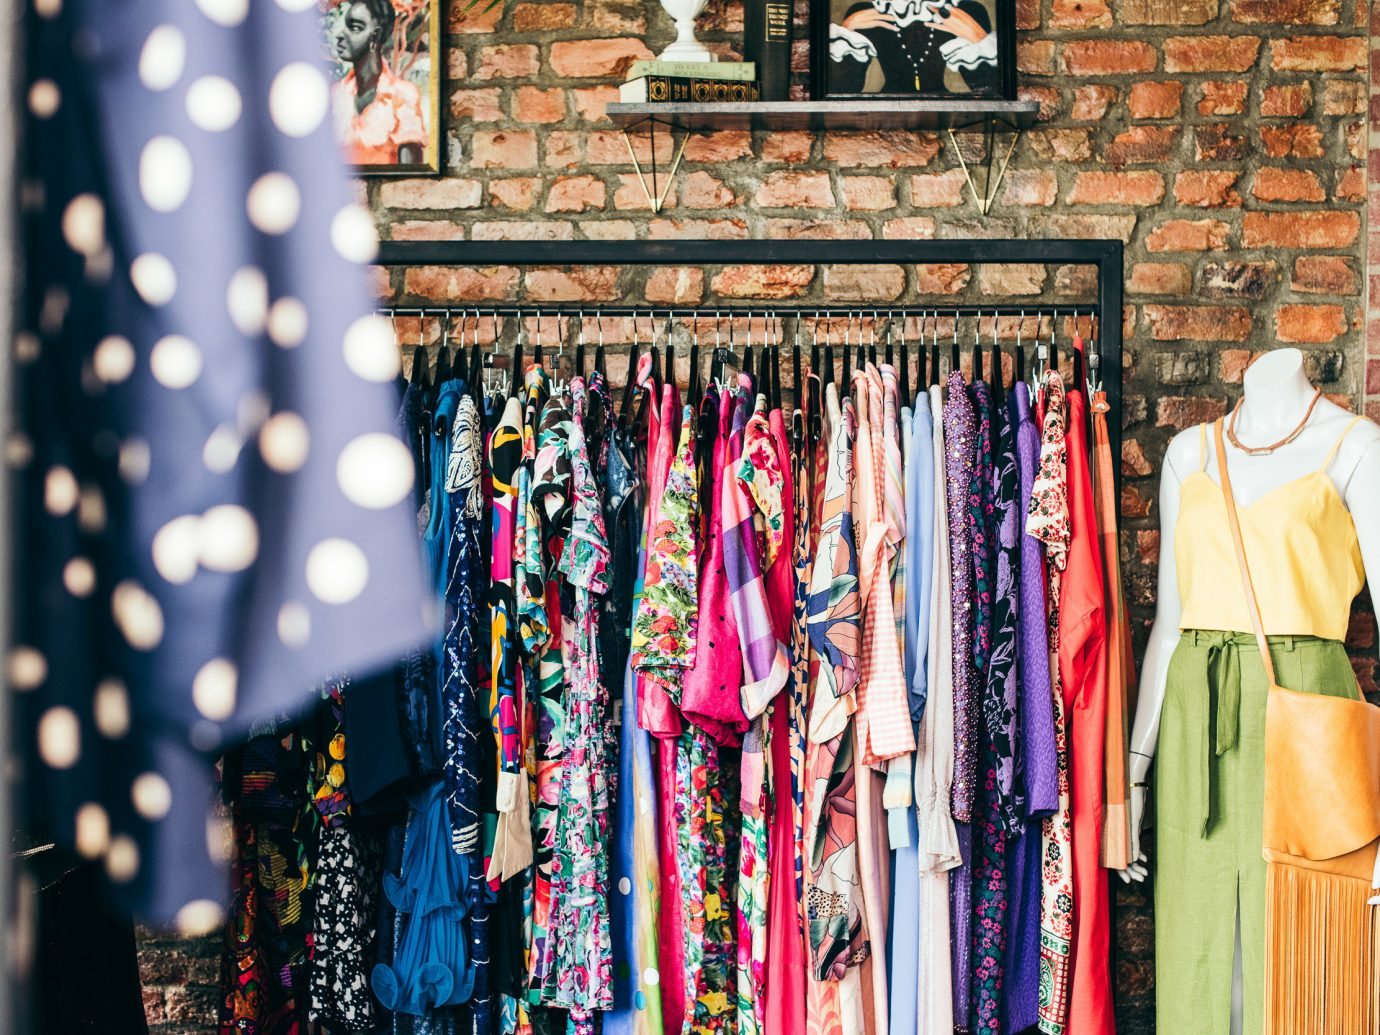 Girls Getaways New Orleans Trip Ideas Weekend Getaways clothing Boutique indoor public space shopping dress fashion City outerwear bazaar textile market retail marketplace wardrobe stylist buyer window decorated